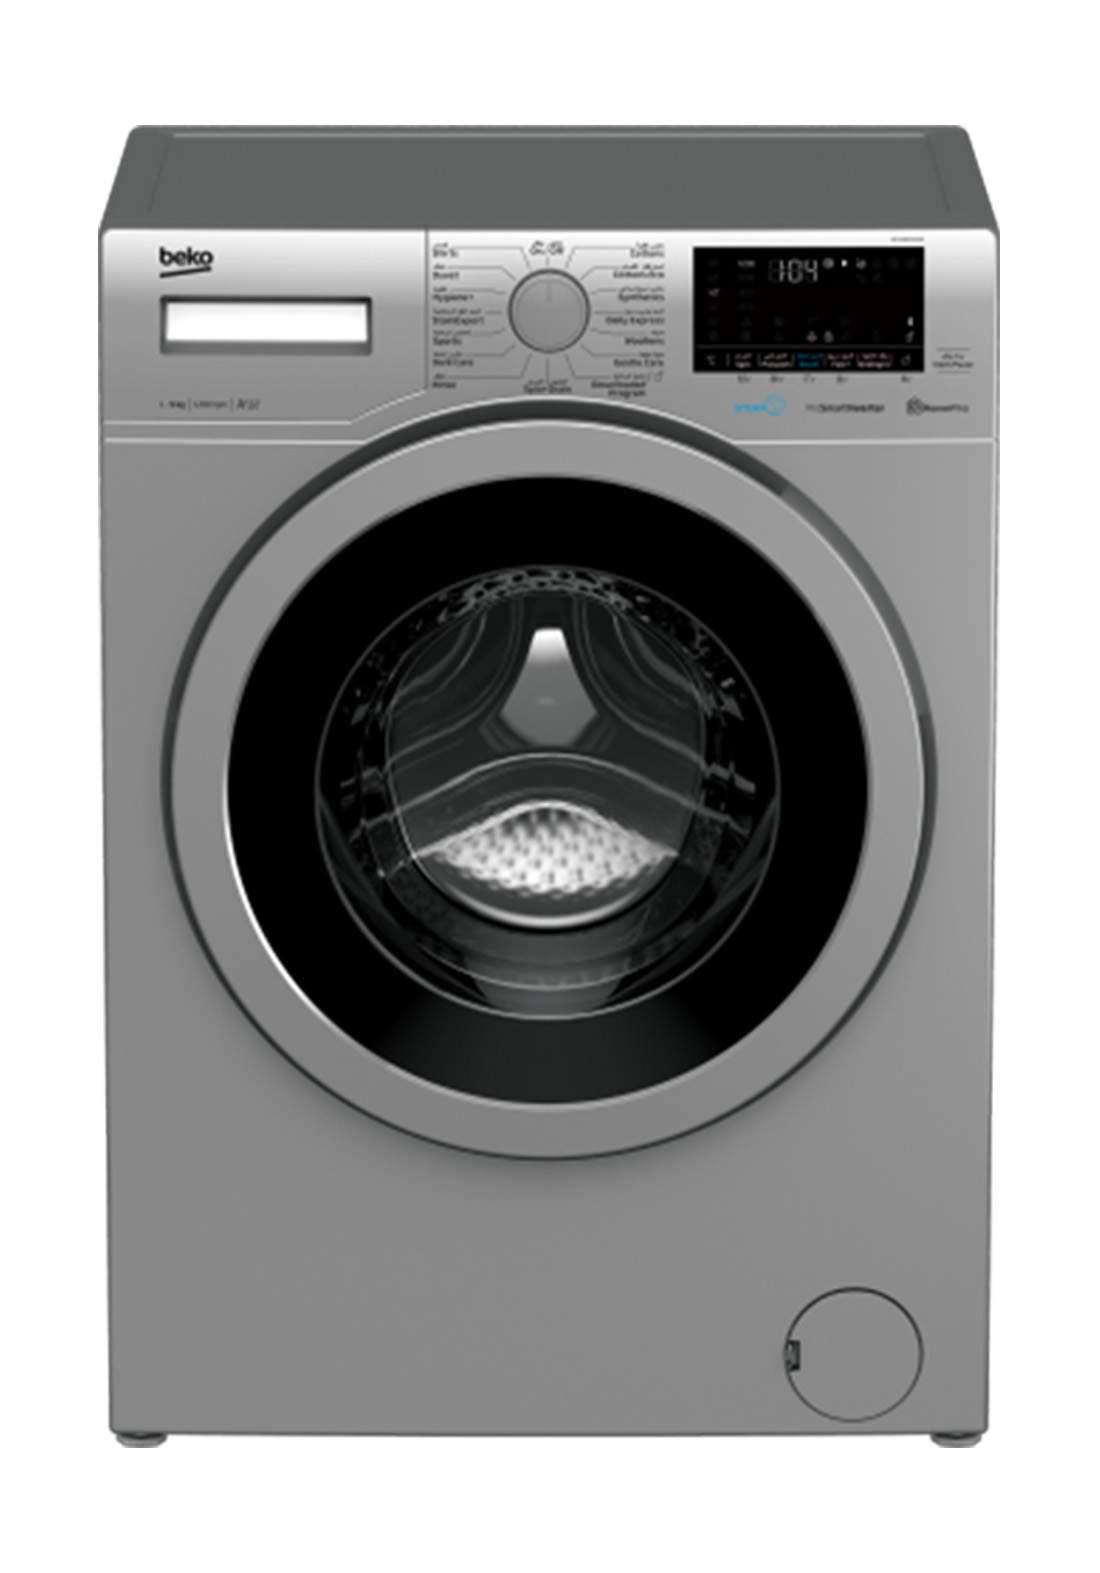 Beko WTV 9632 XS0S Washing Machine 9 kg 16 Programs 1200 RPM- Silver غسالة أوتماتيك